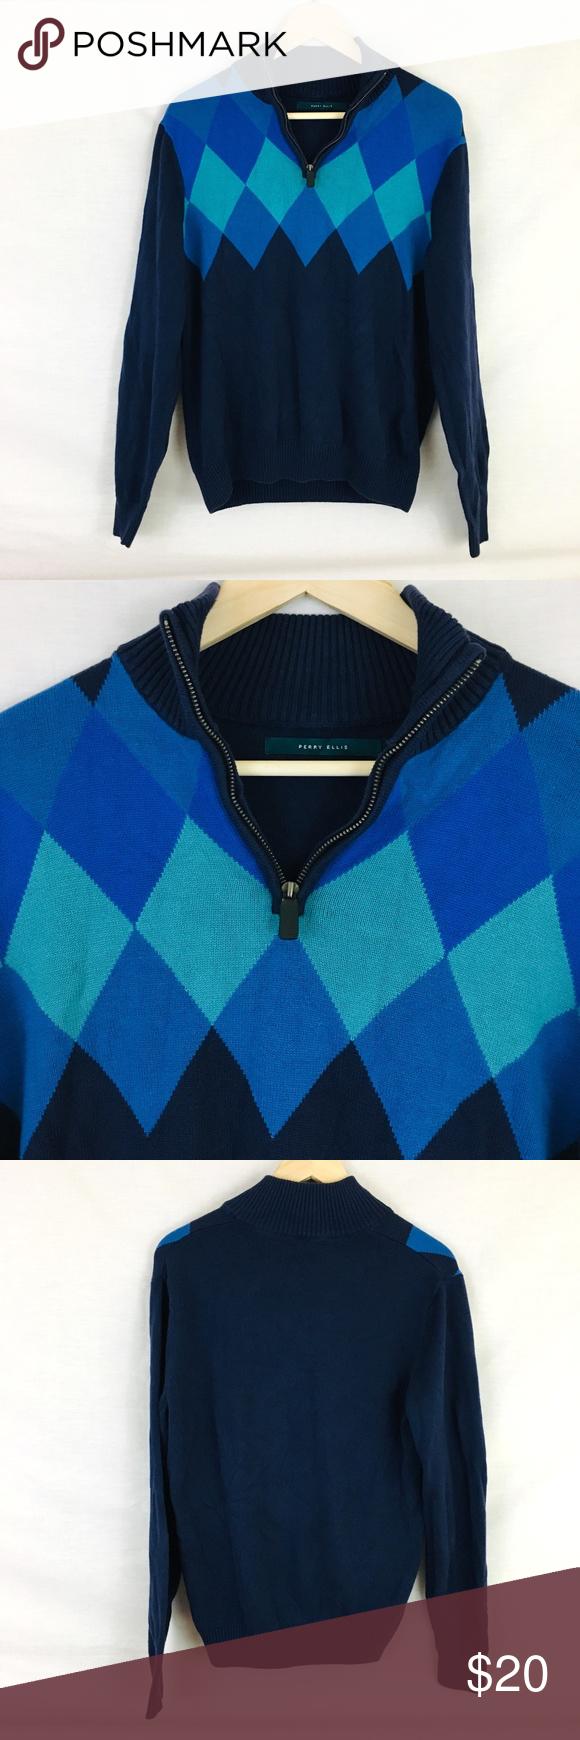 732188d021 Perry Ellis Quarter Zip Diamond Pattern Sweater M Perry Ellis Pullover  Sweater - Men s size M